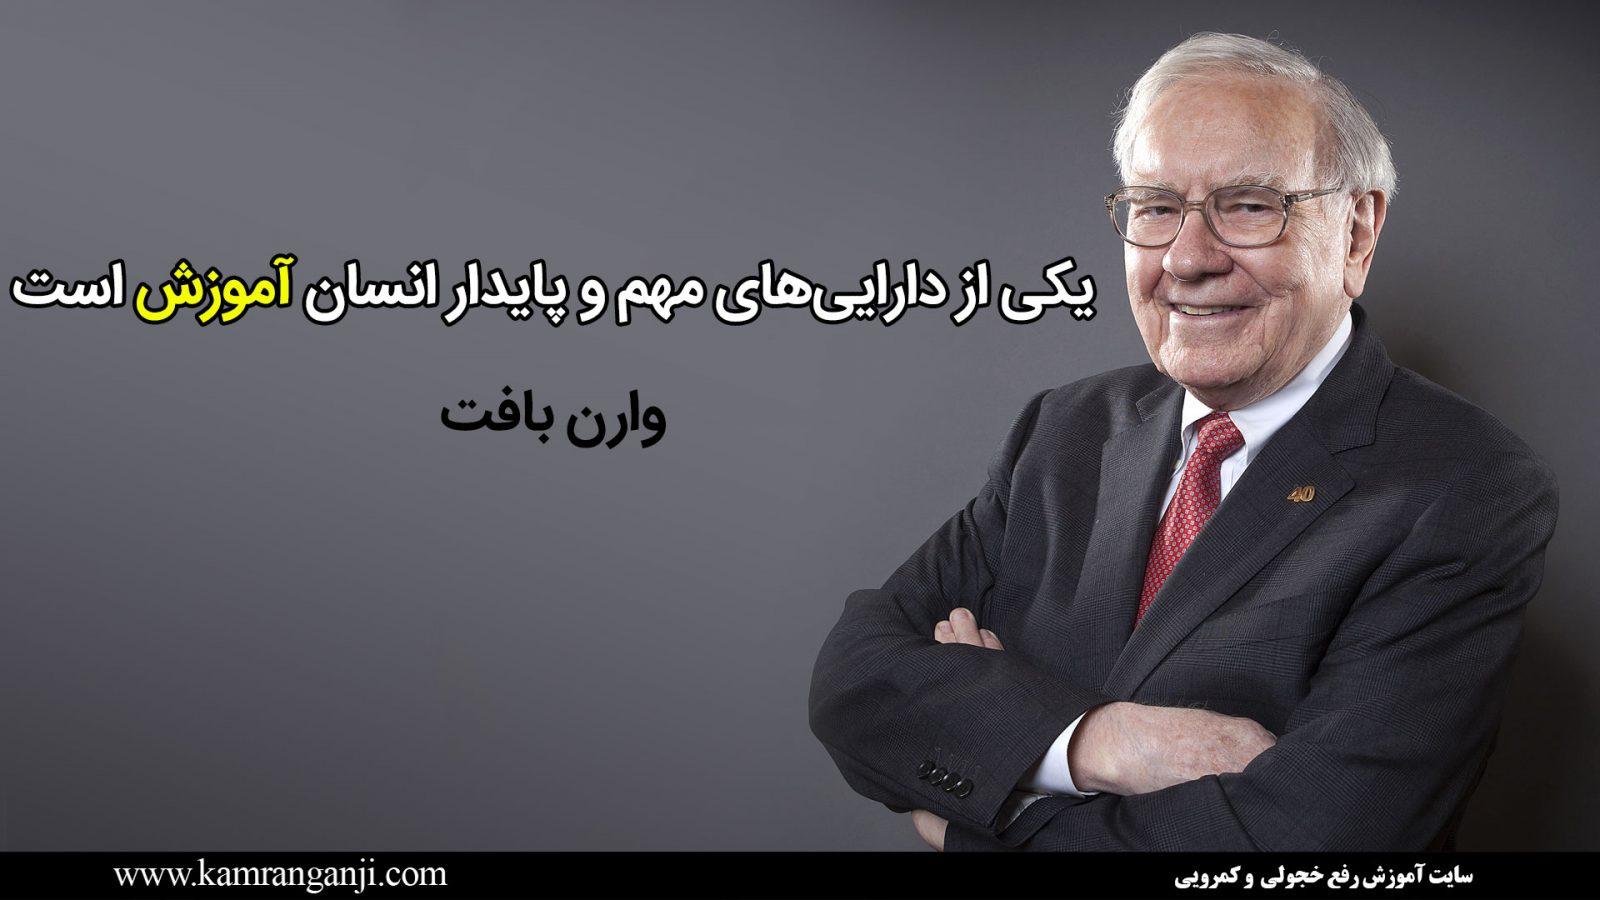 وبینار فیلم وبینار آموزش سخنرانی ویژه افراد خجالتی Warren Buffett